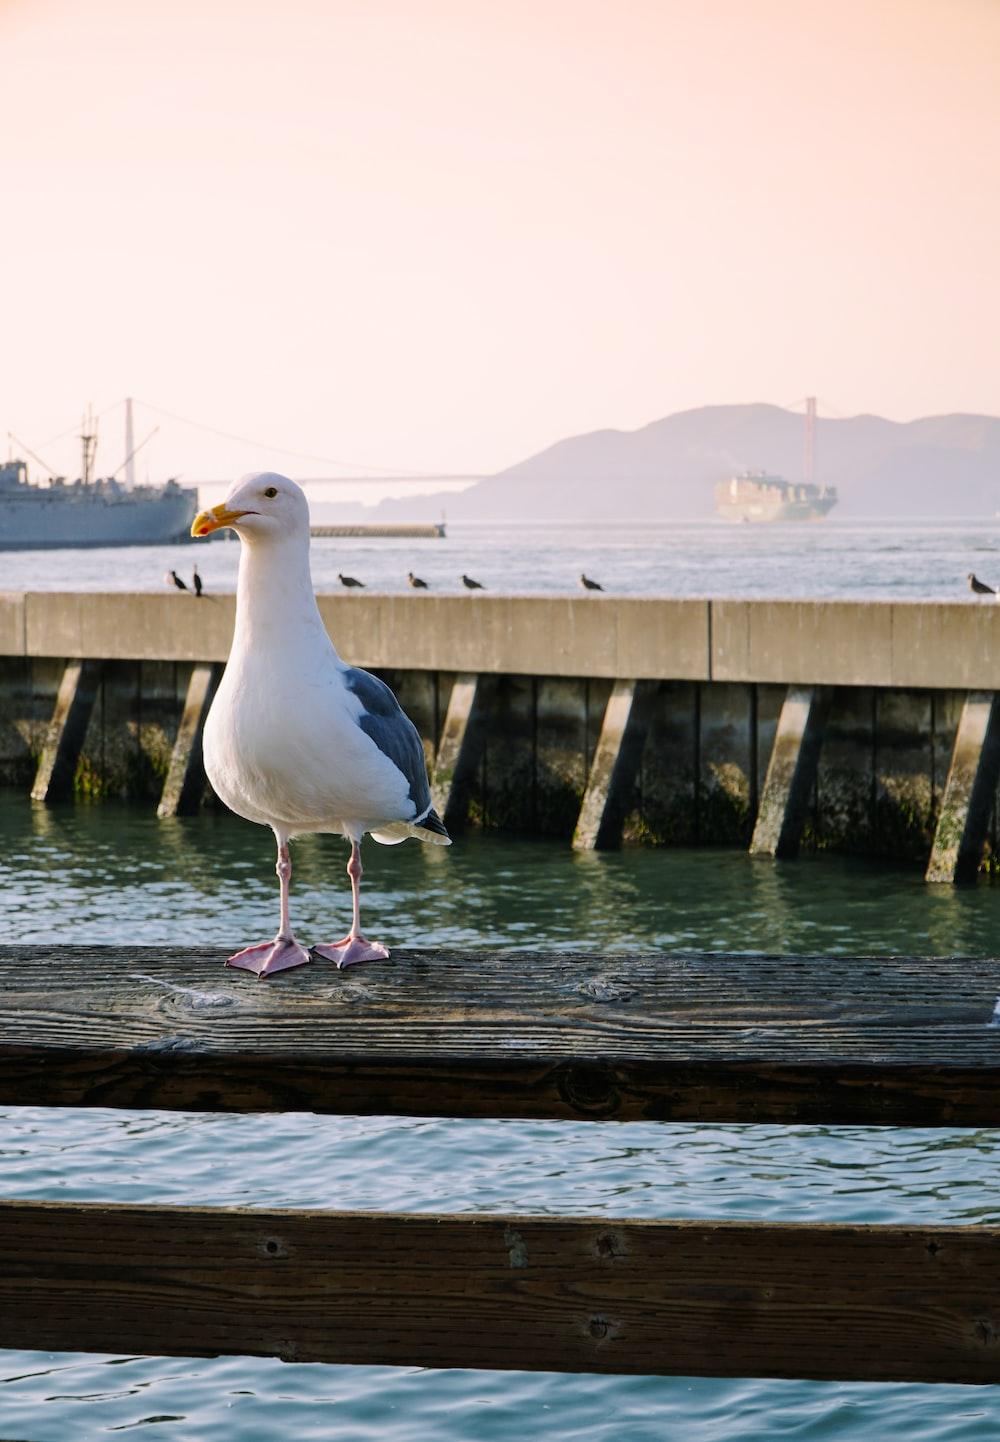 seagull on wooden dock